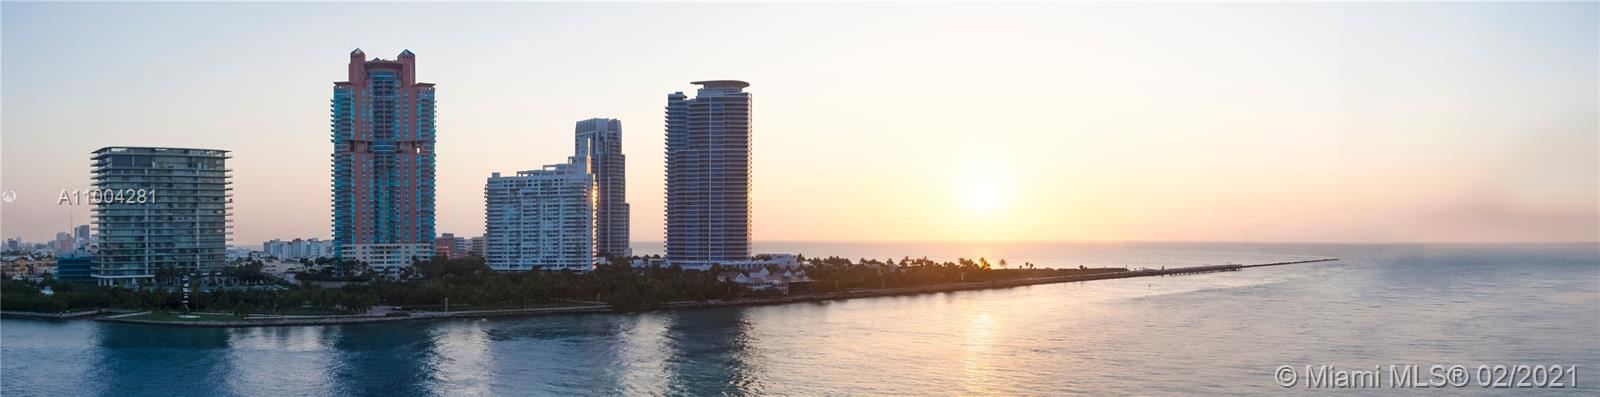 6800 Fisher Island Dr #6854, Miami Beach, FL 33109 - #: A11004281